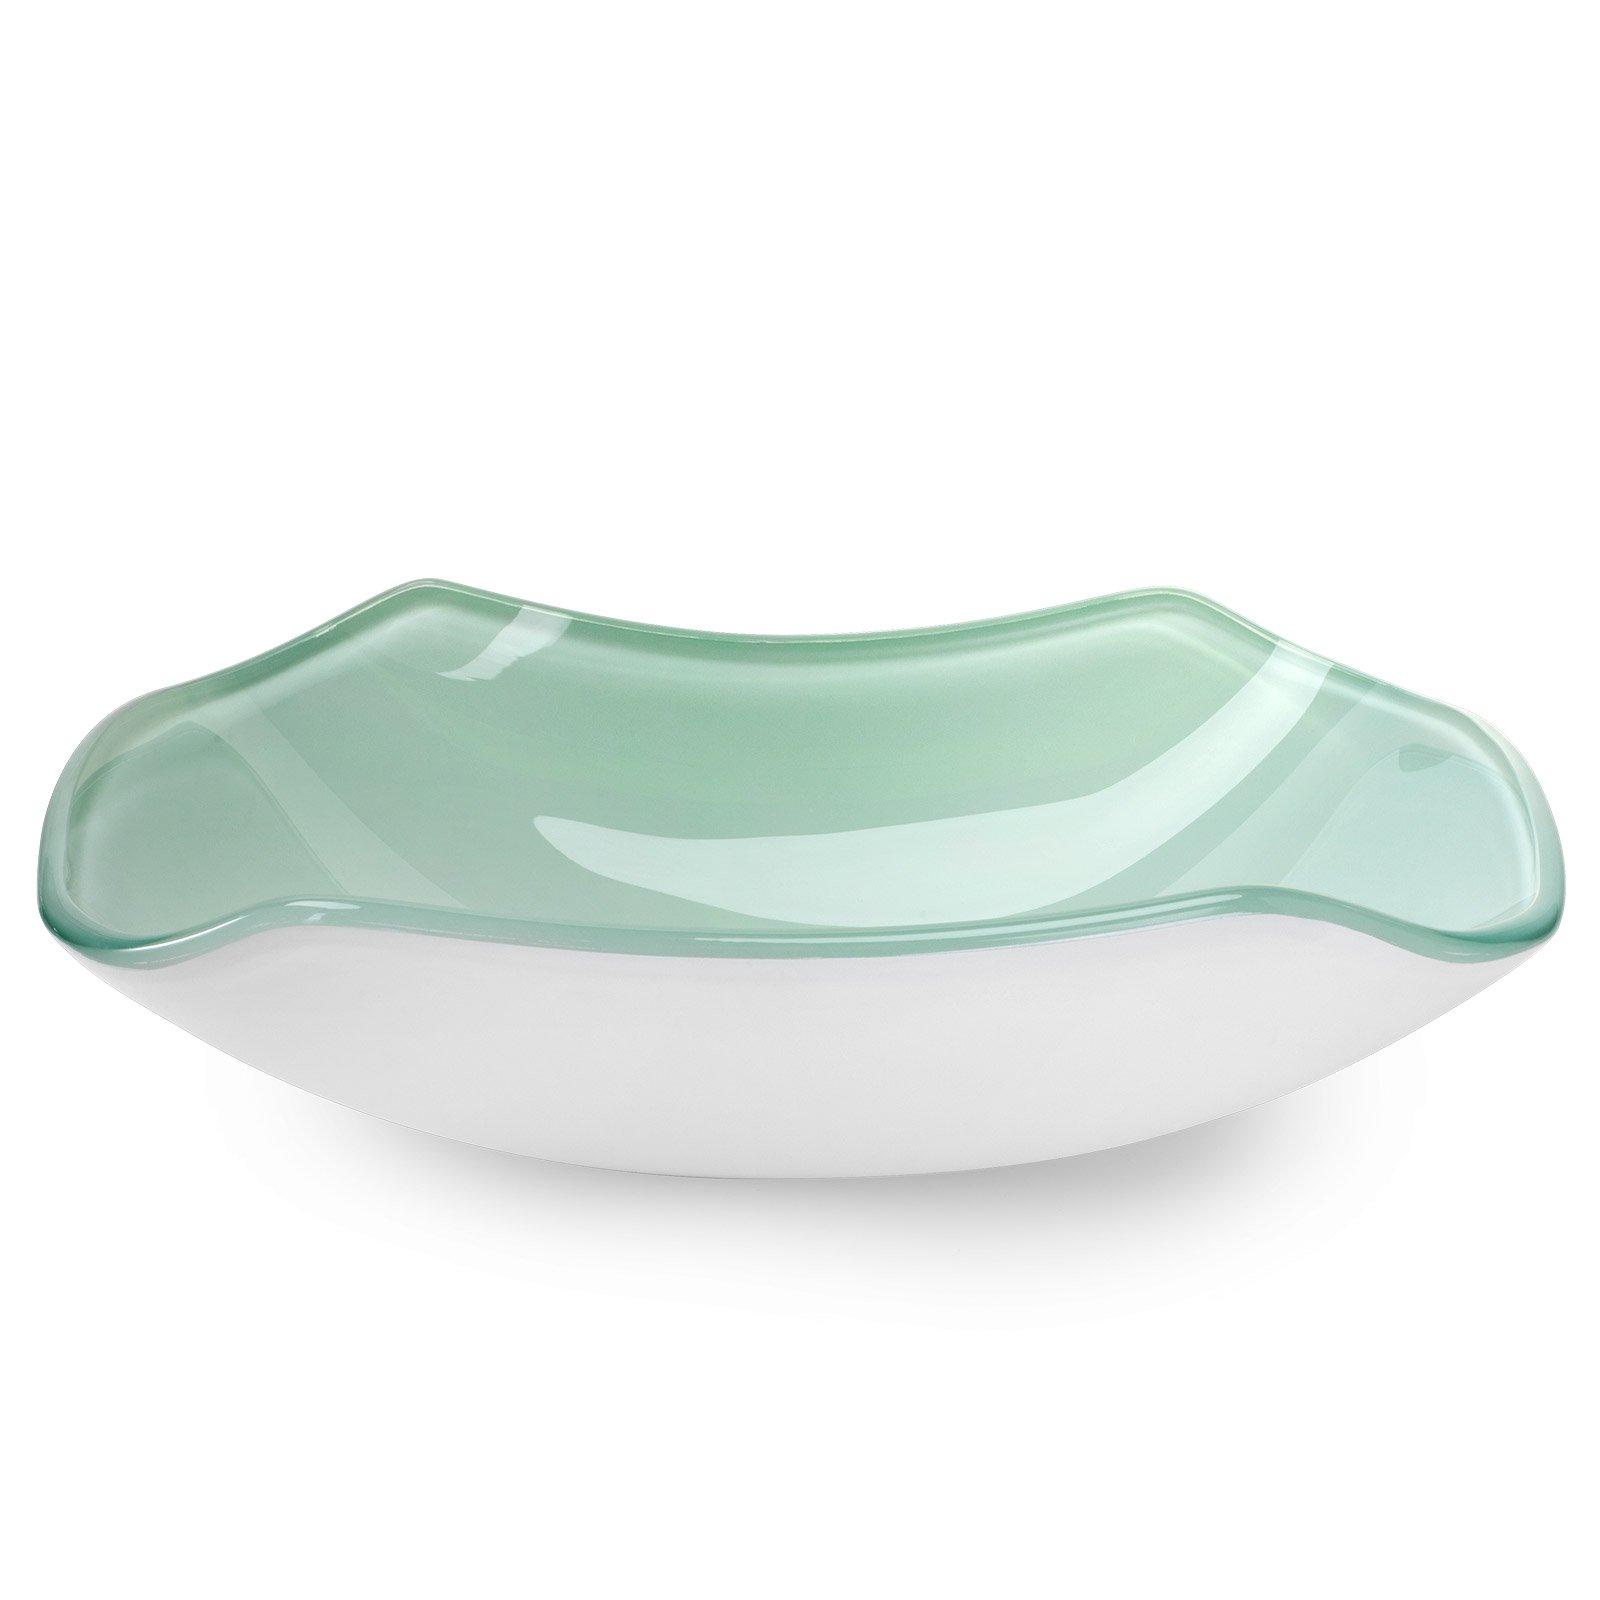 Miligoré Modern Glass Vessel Sink - Above Counter Bathroom Vanity Basin Bowl - Scalloped Clear & White